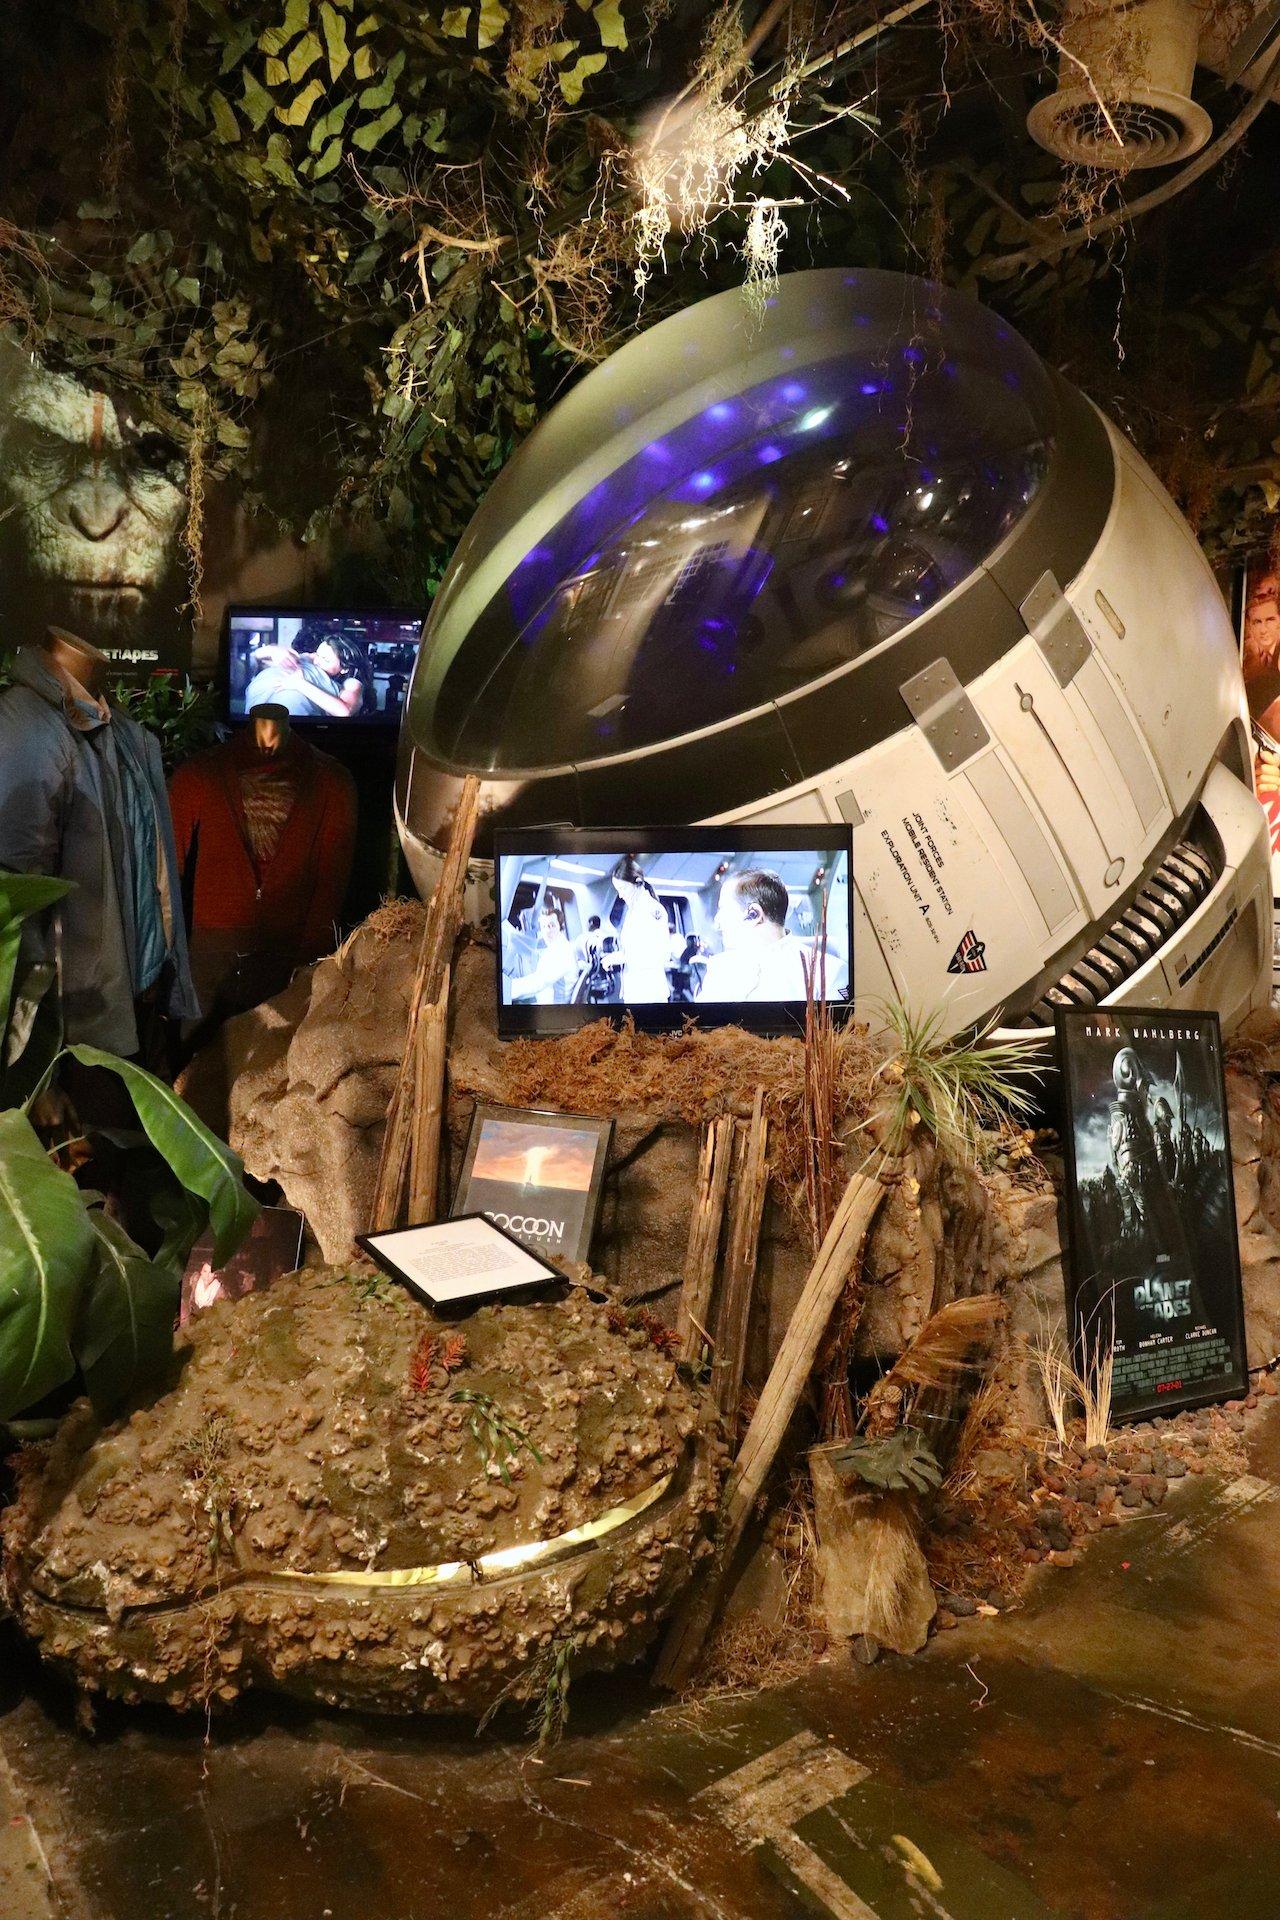 LA Trip Hollywood Museum Sci-Fi Exhibit